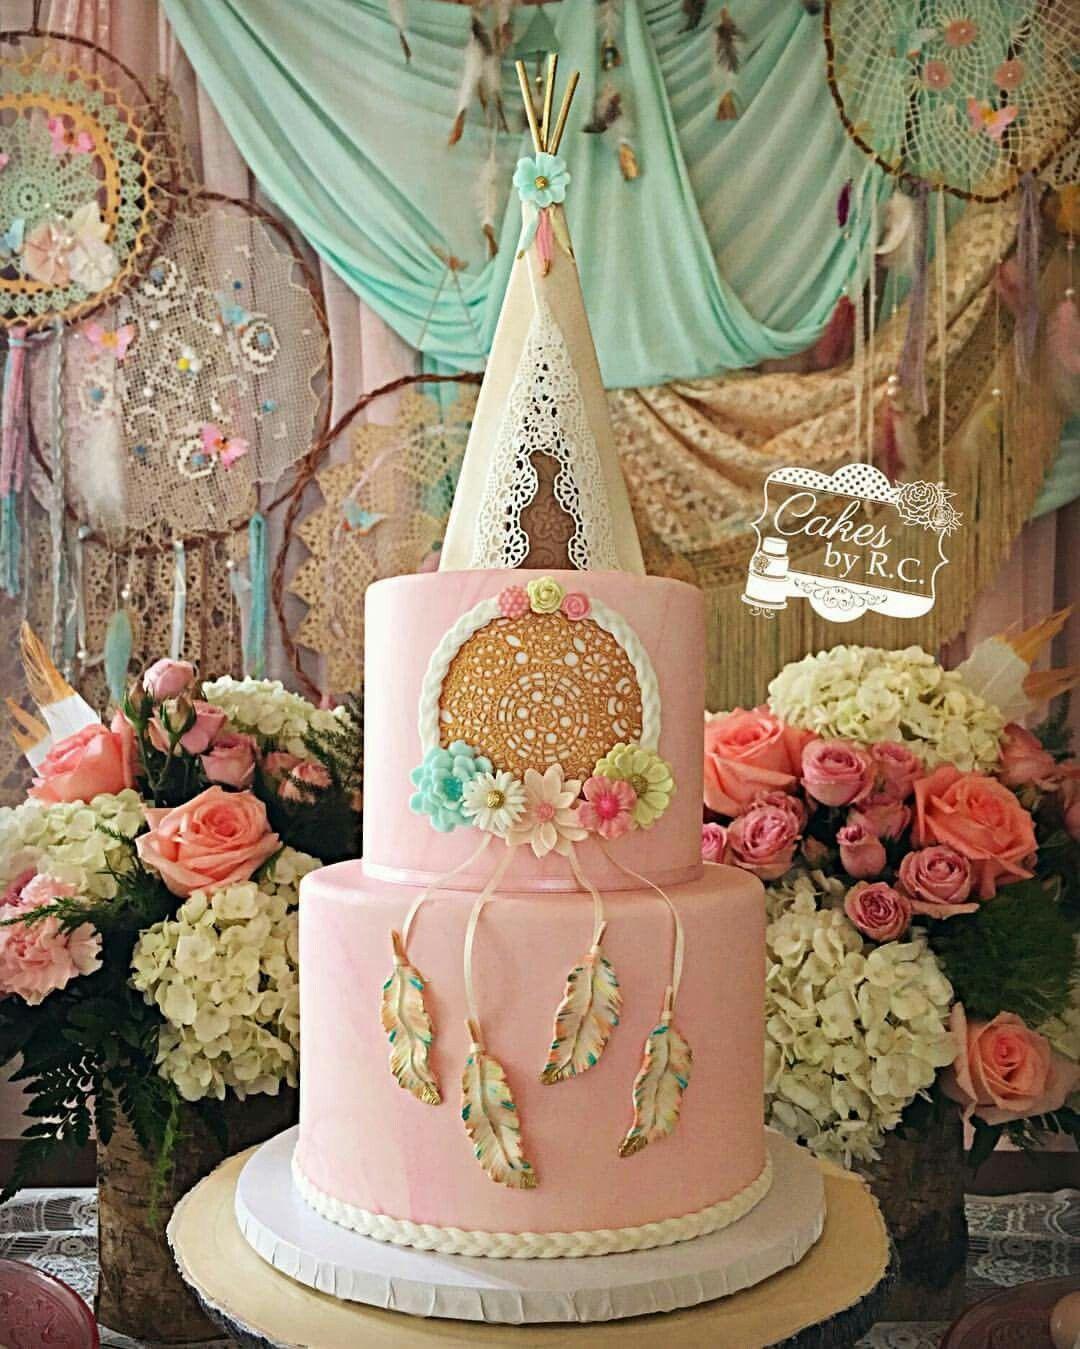 1000 Ideas About Girls Teepee On Pinterest: Boho, Cake And Birthdays